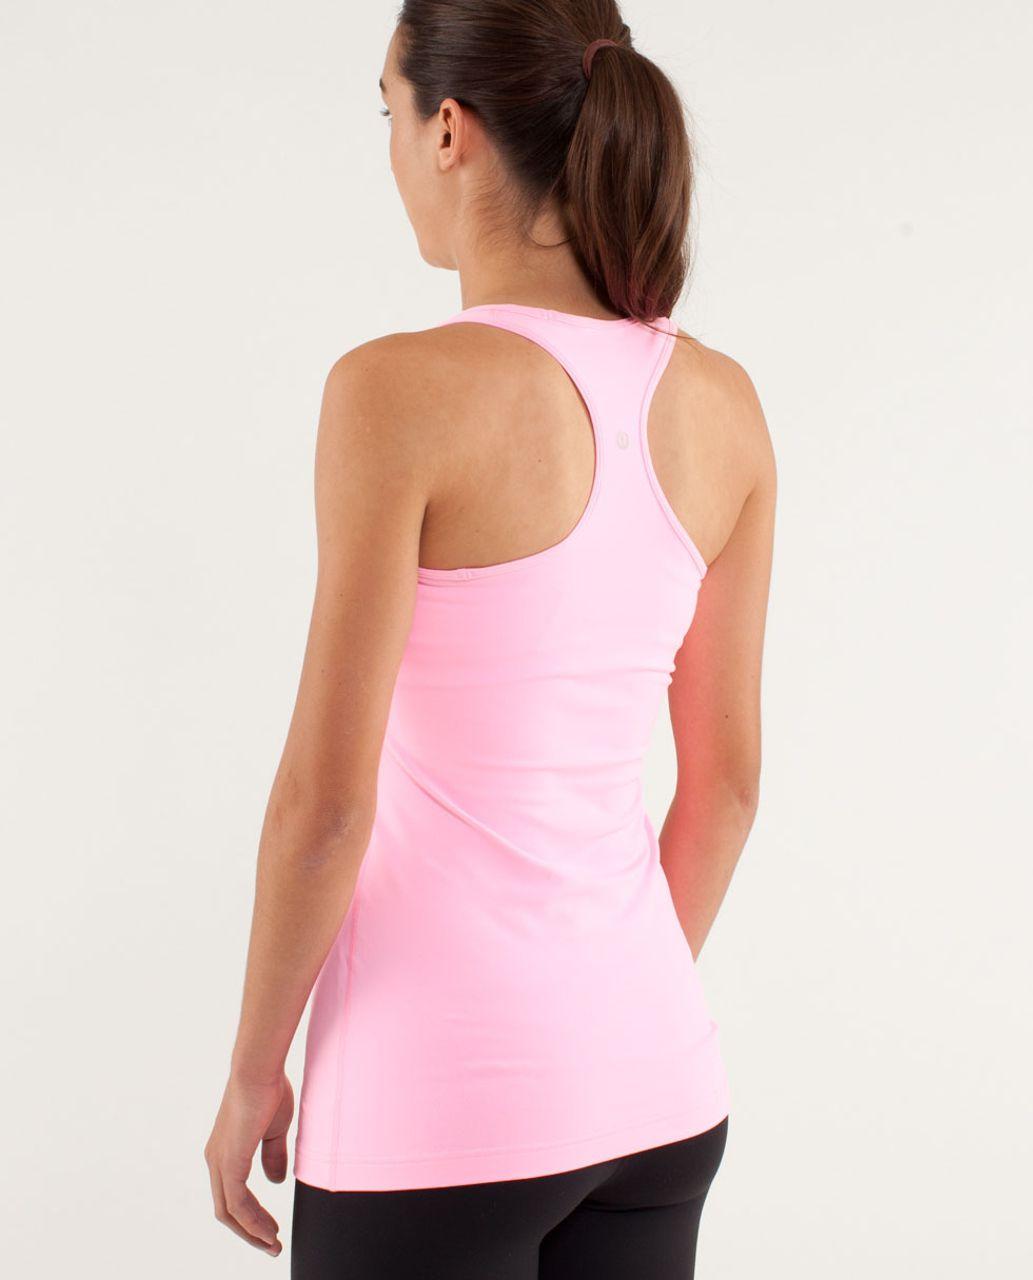 Lululemon Cool Racerback - Pink Shell